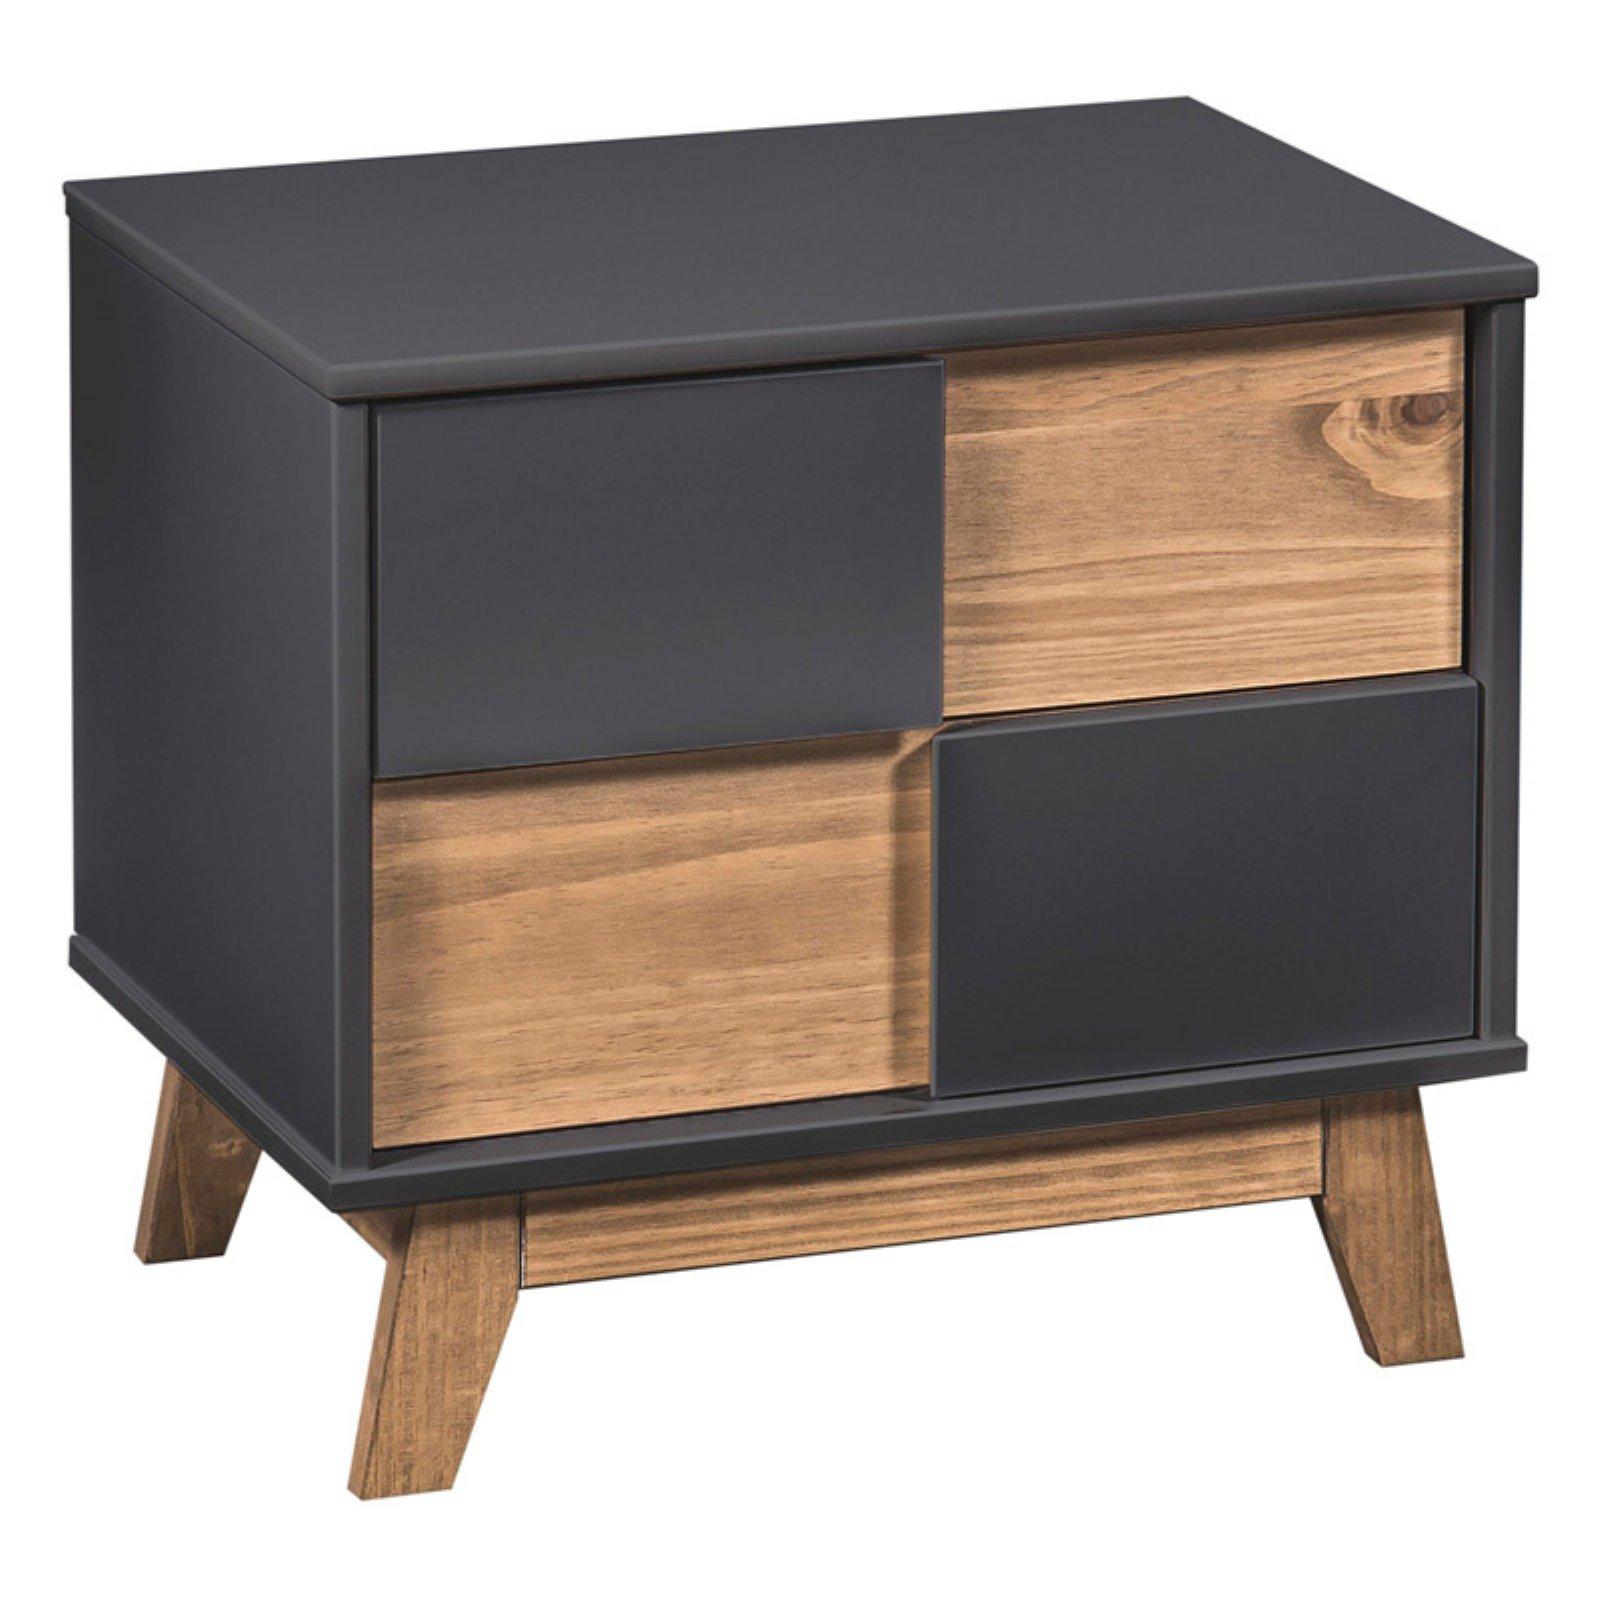 Manhattan Comfort Mid- Century Rustic Modern Livonia 2-Drawer Nightstand in Dark Grey and Natural Wood